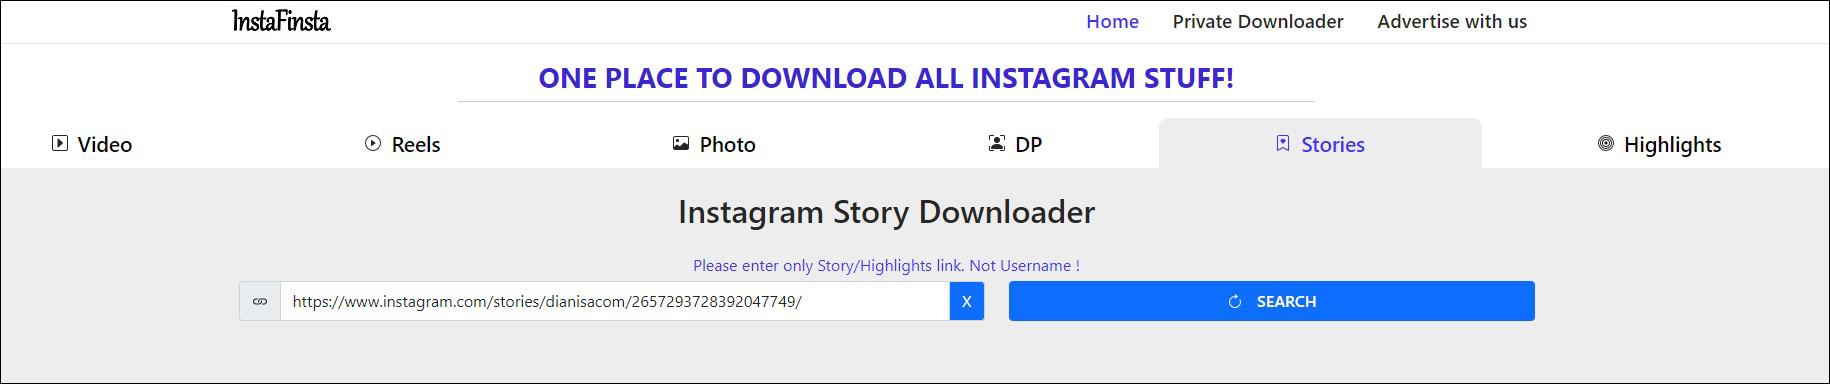 1 Masukkan link story Instagram